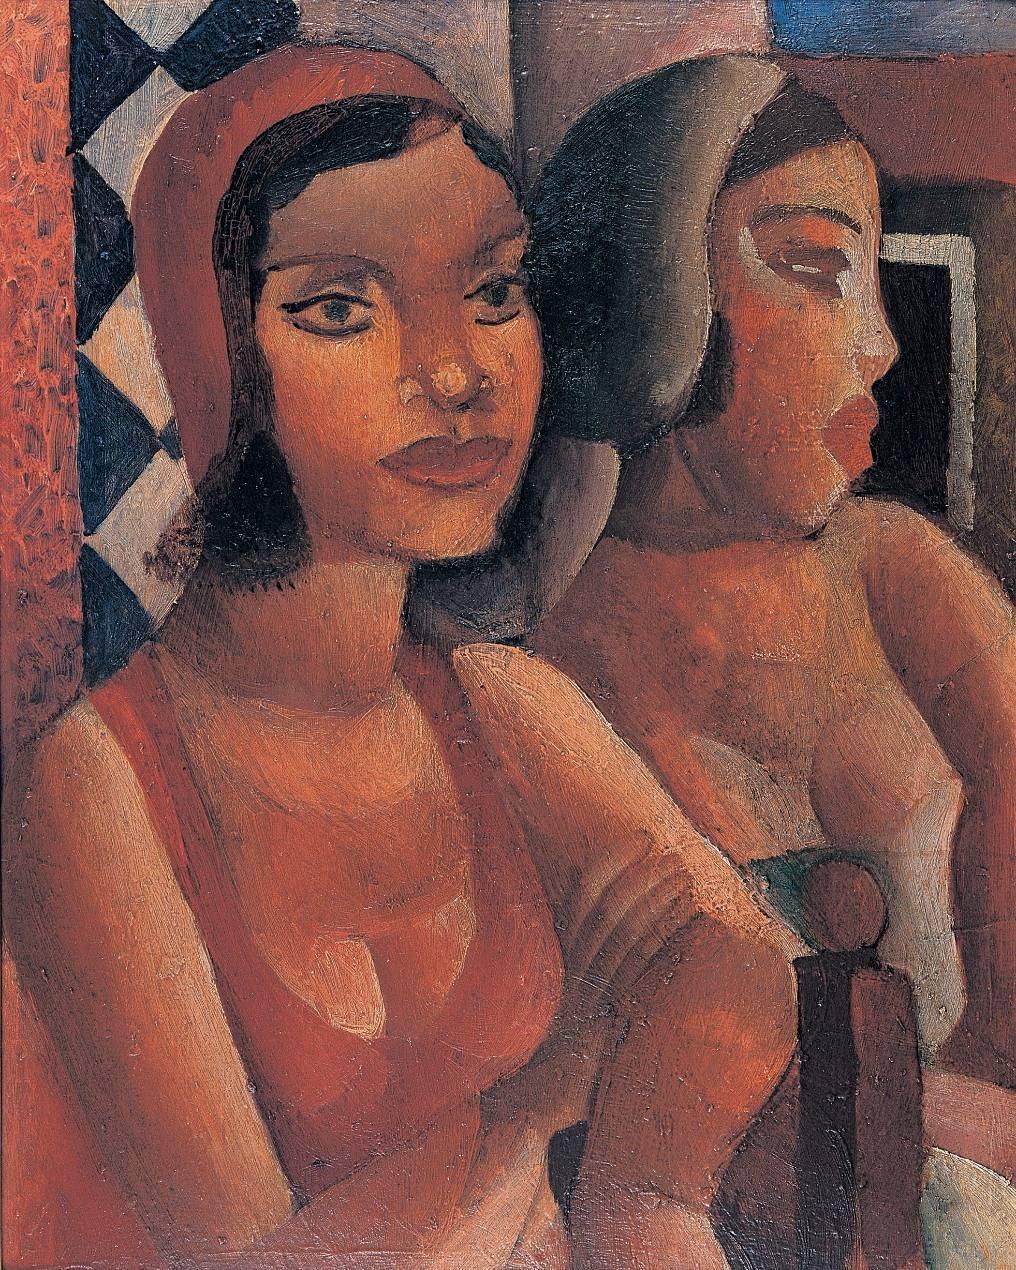 Mulheres na Janela, 1926